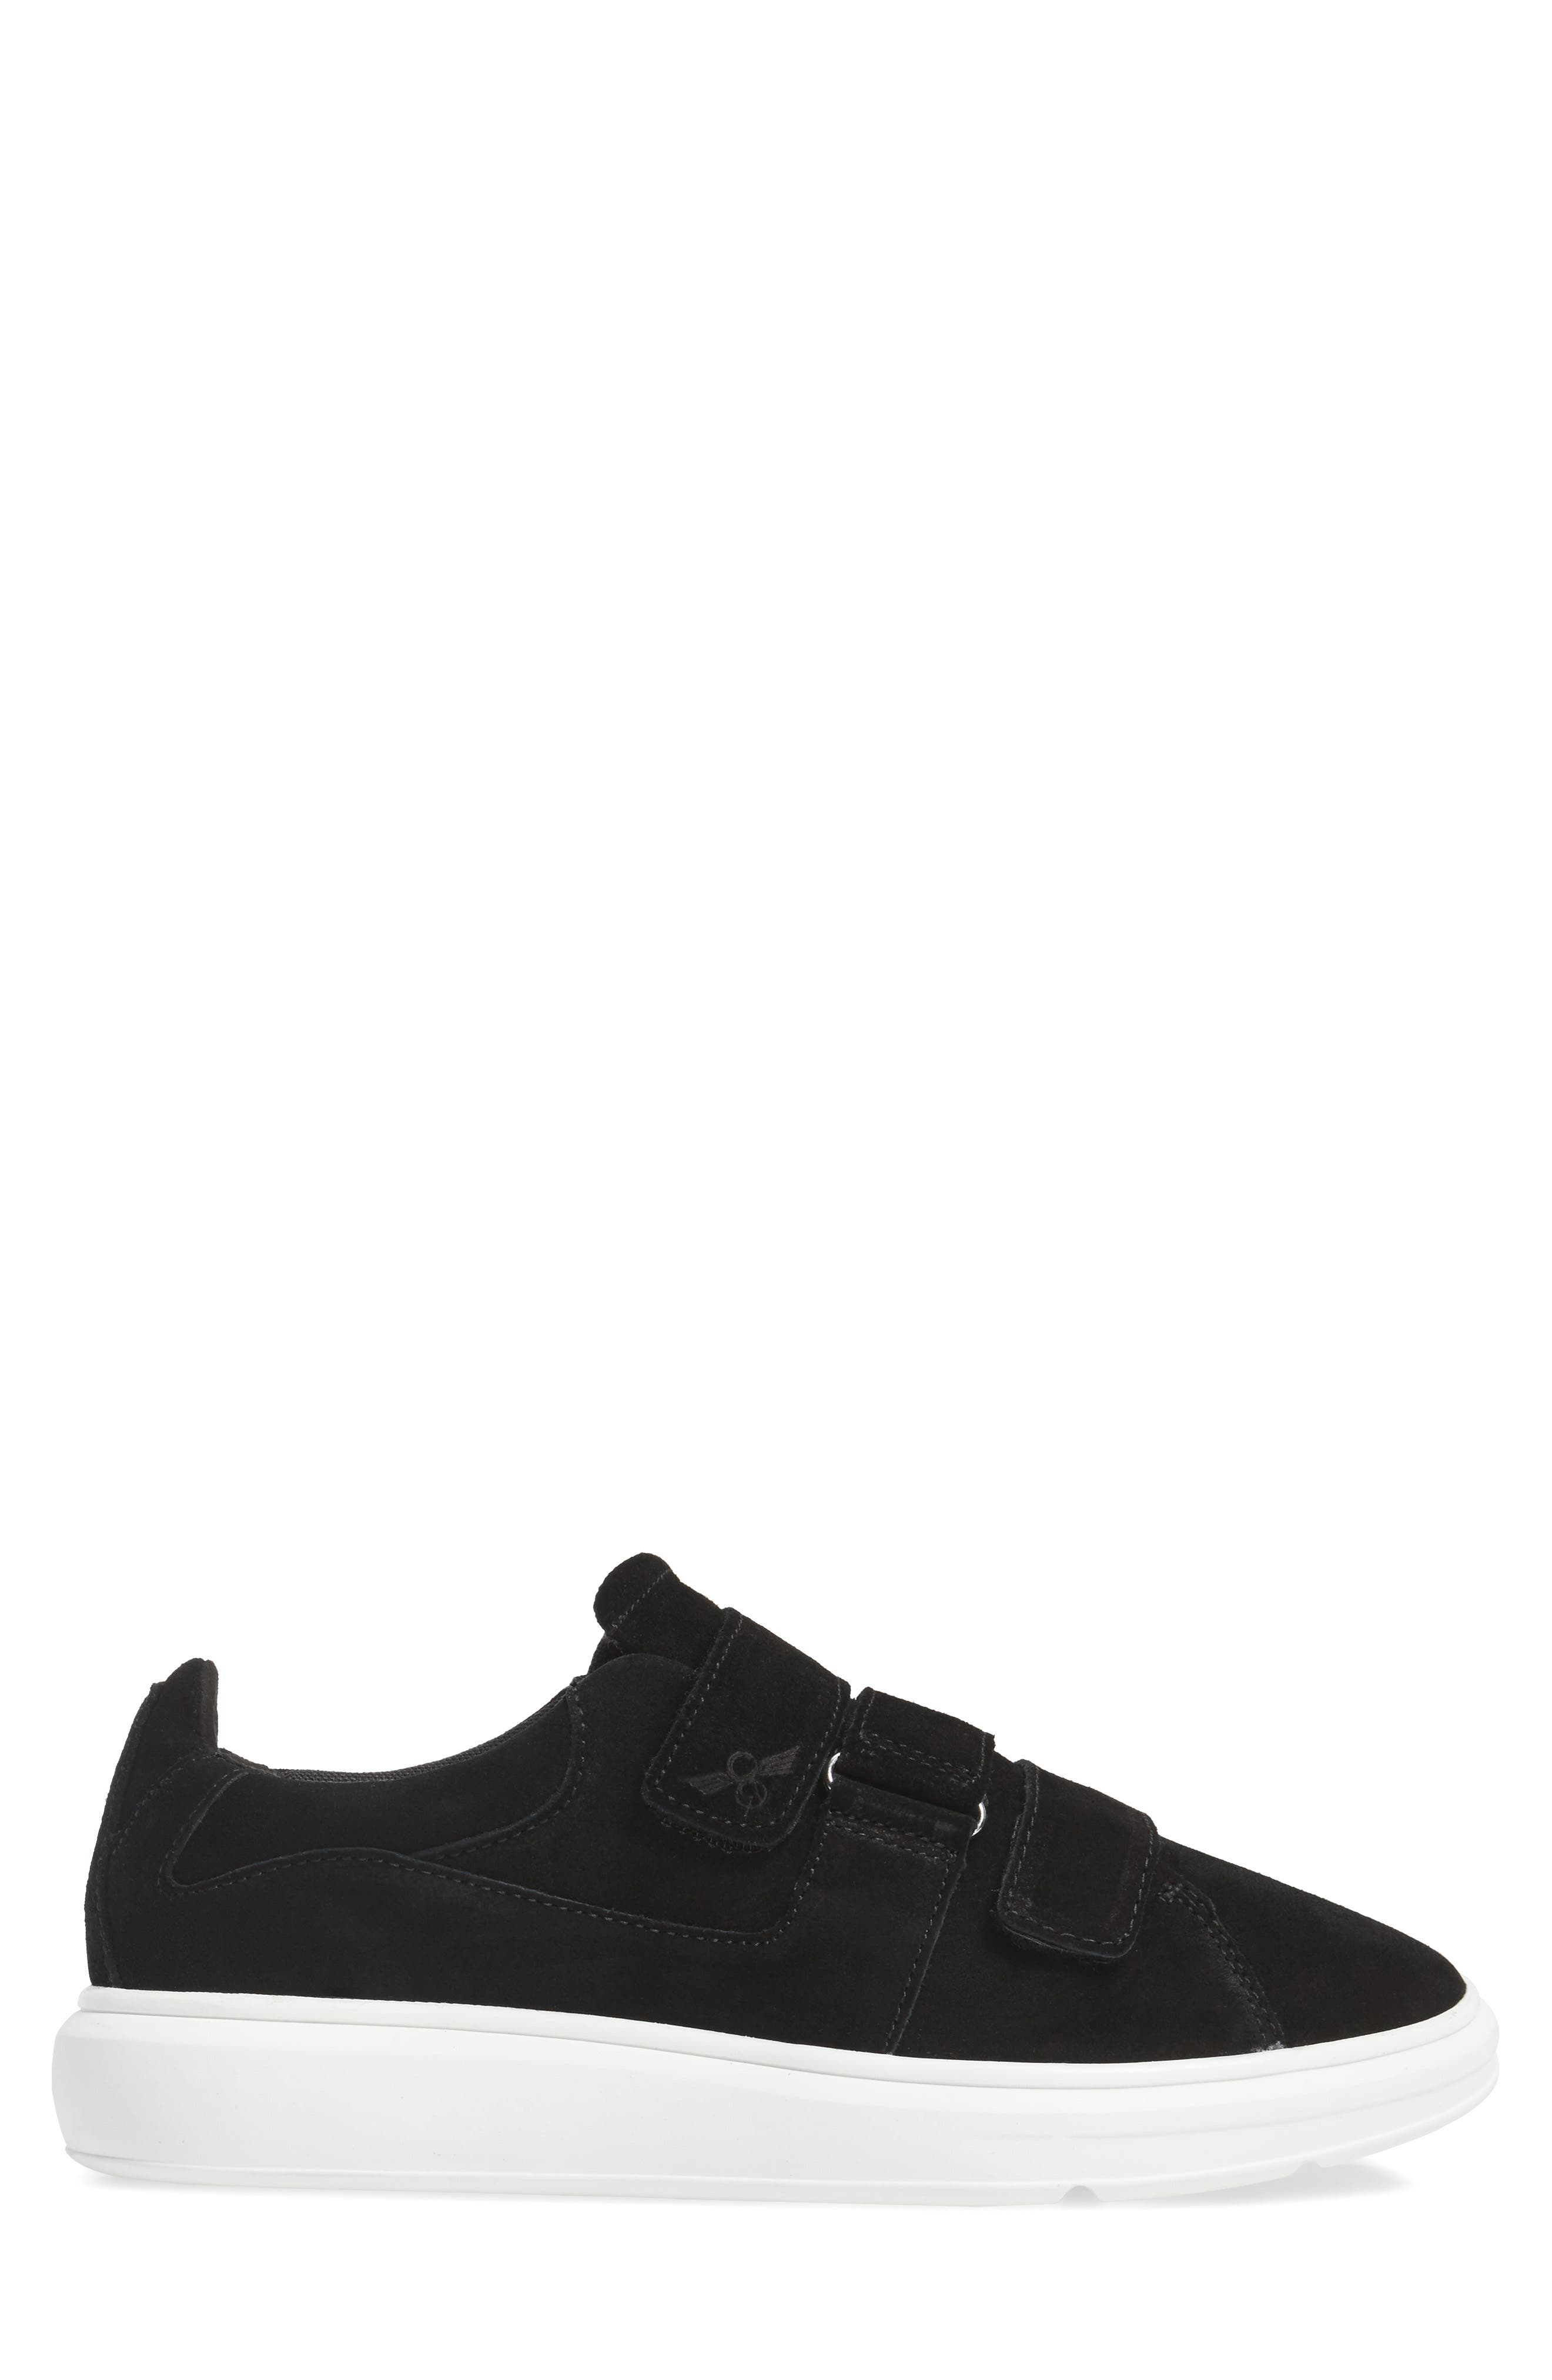 Meleti Sneaker,                             Alternate thumbnail 3, color,                             001